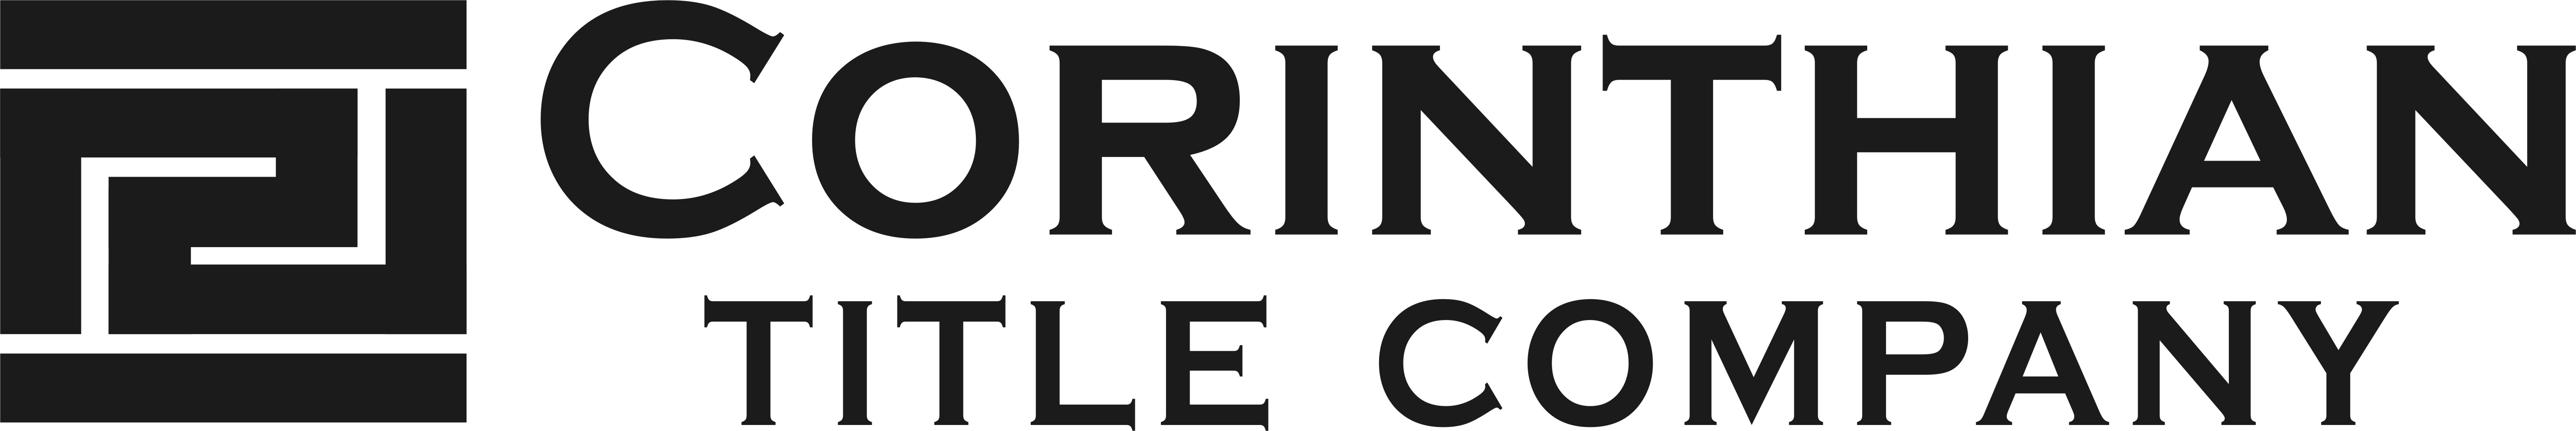 Corinthian Title Company logo